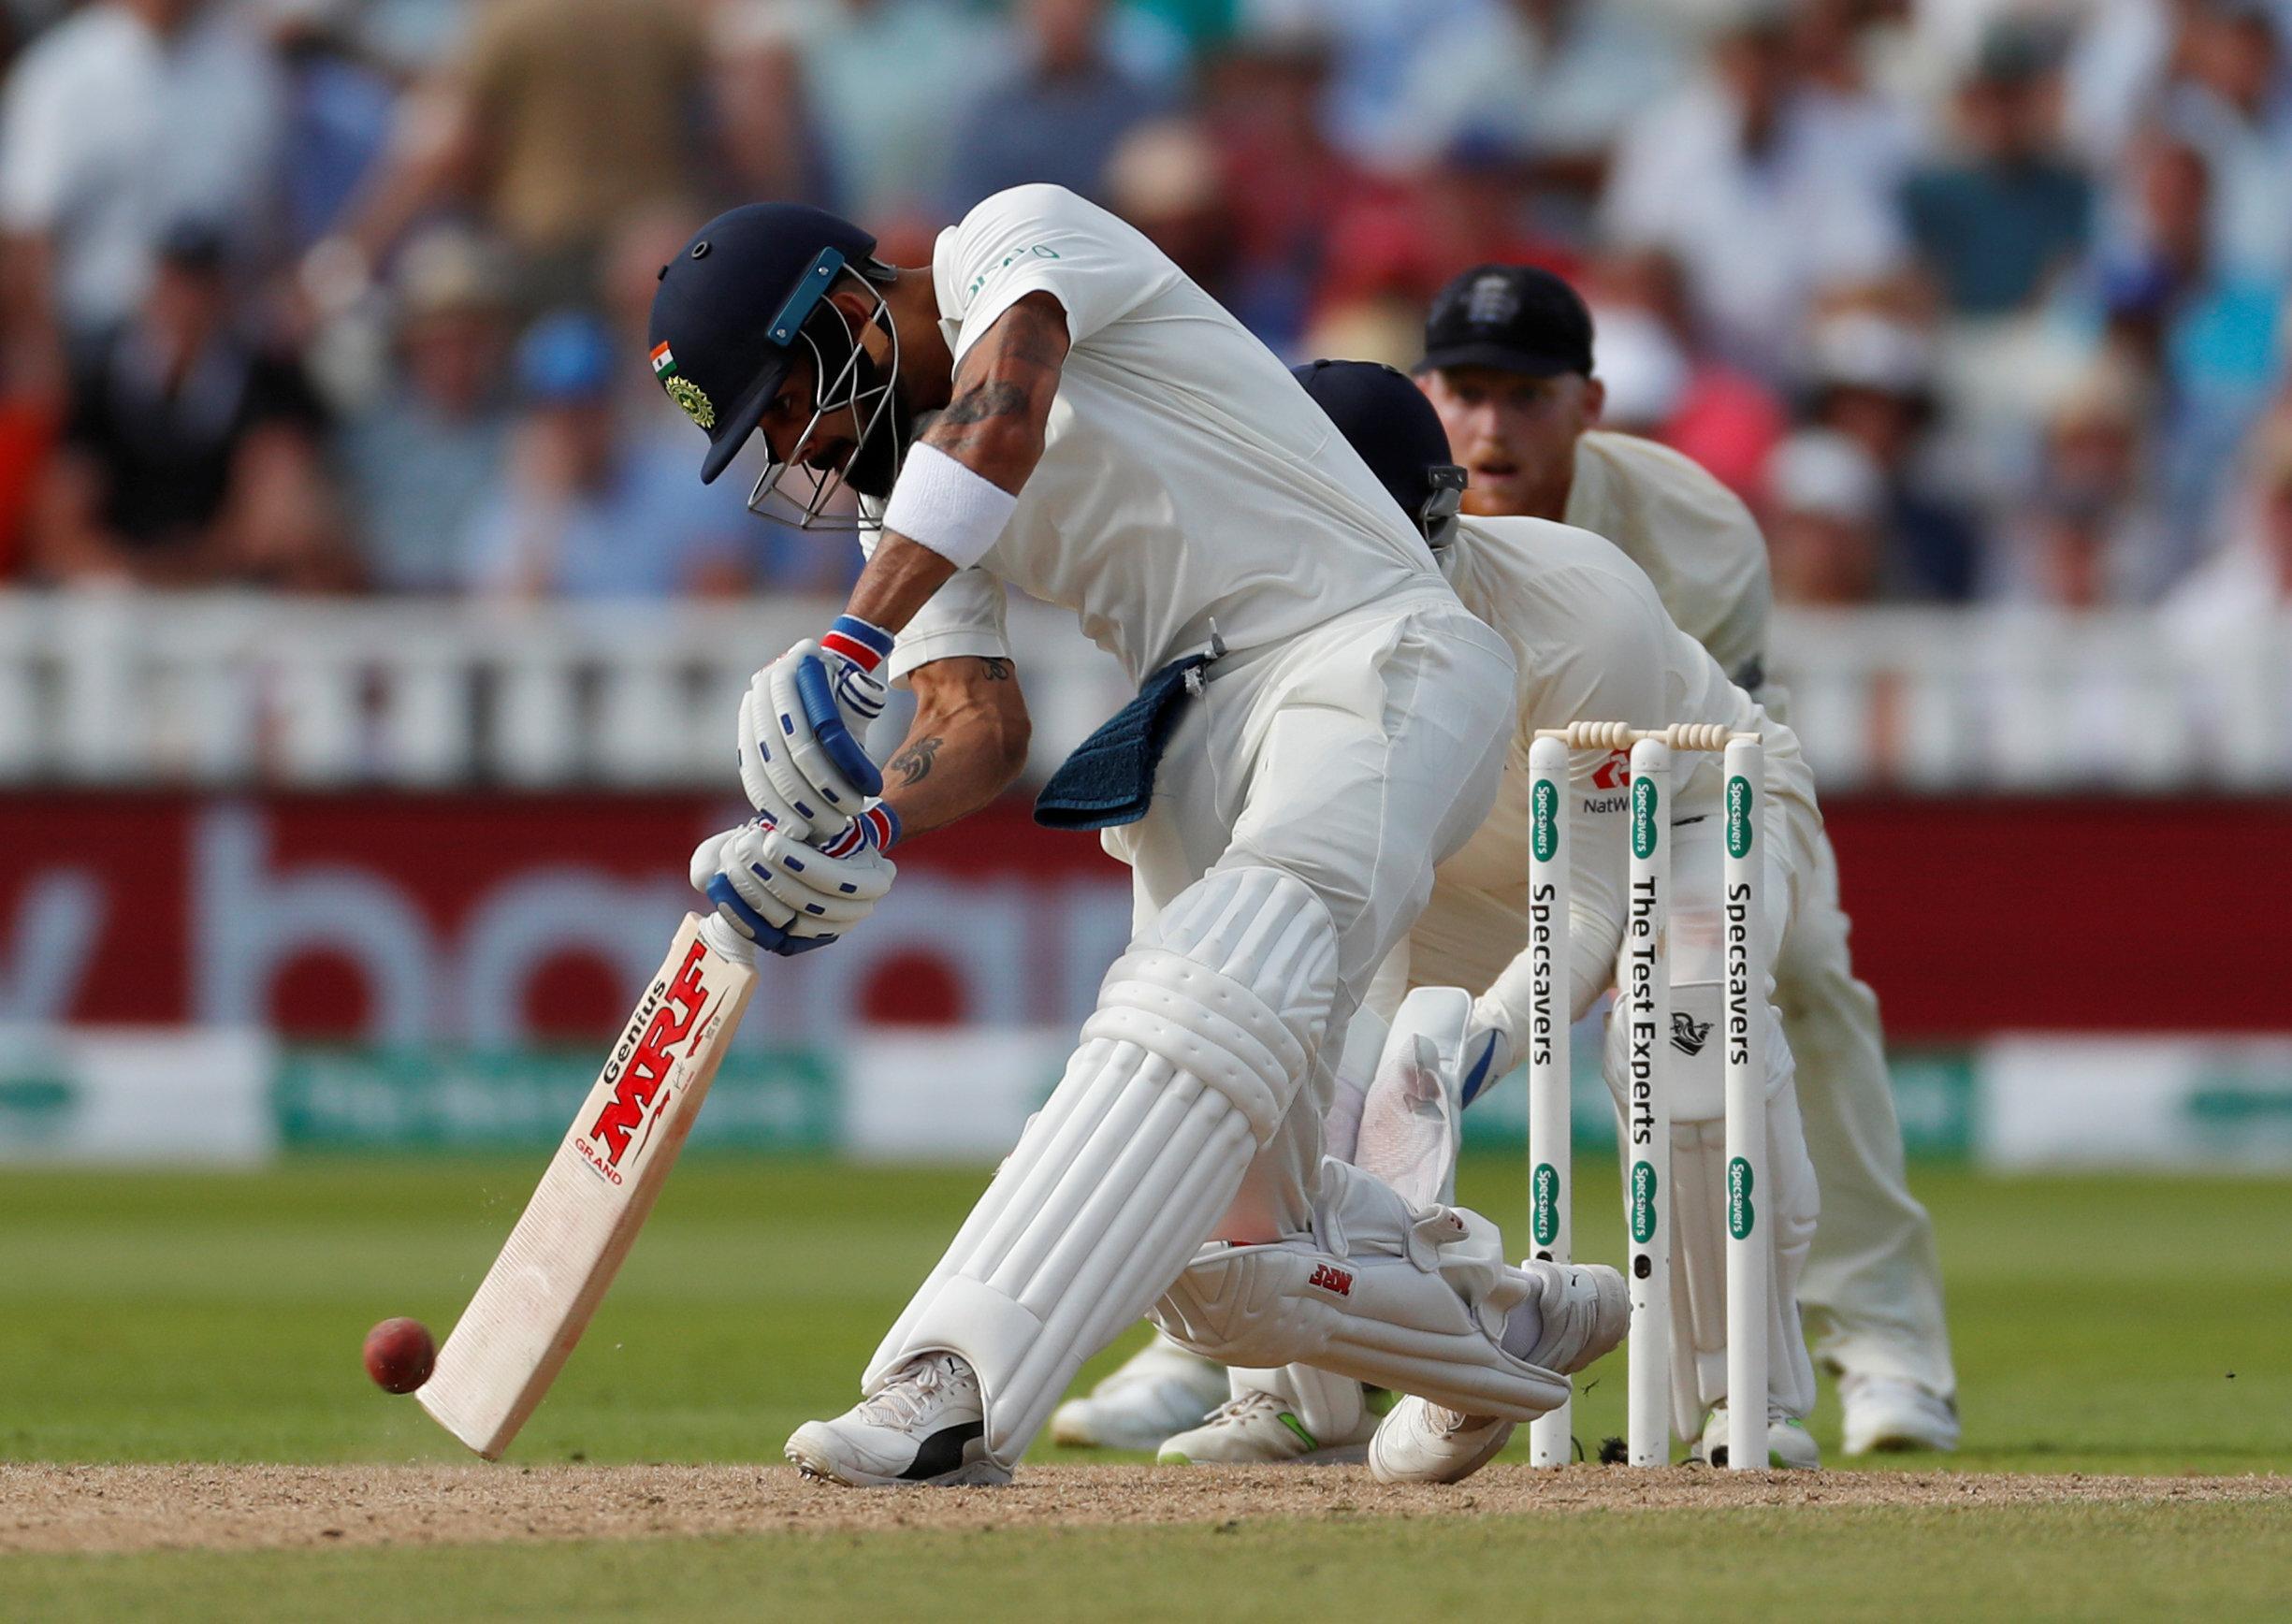 Virat Kohli was the only India batsman to make a sizeable score